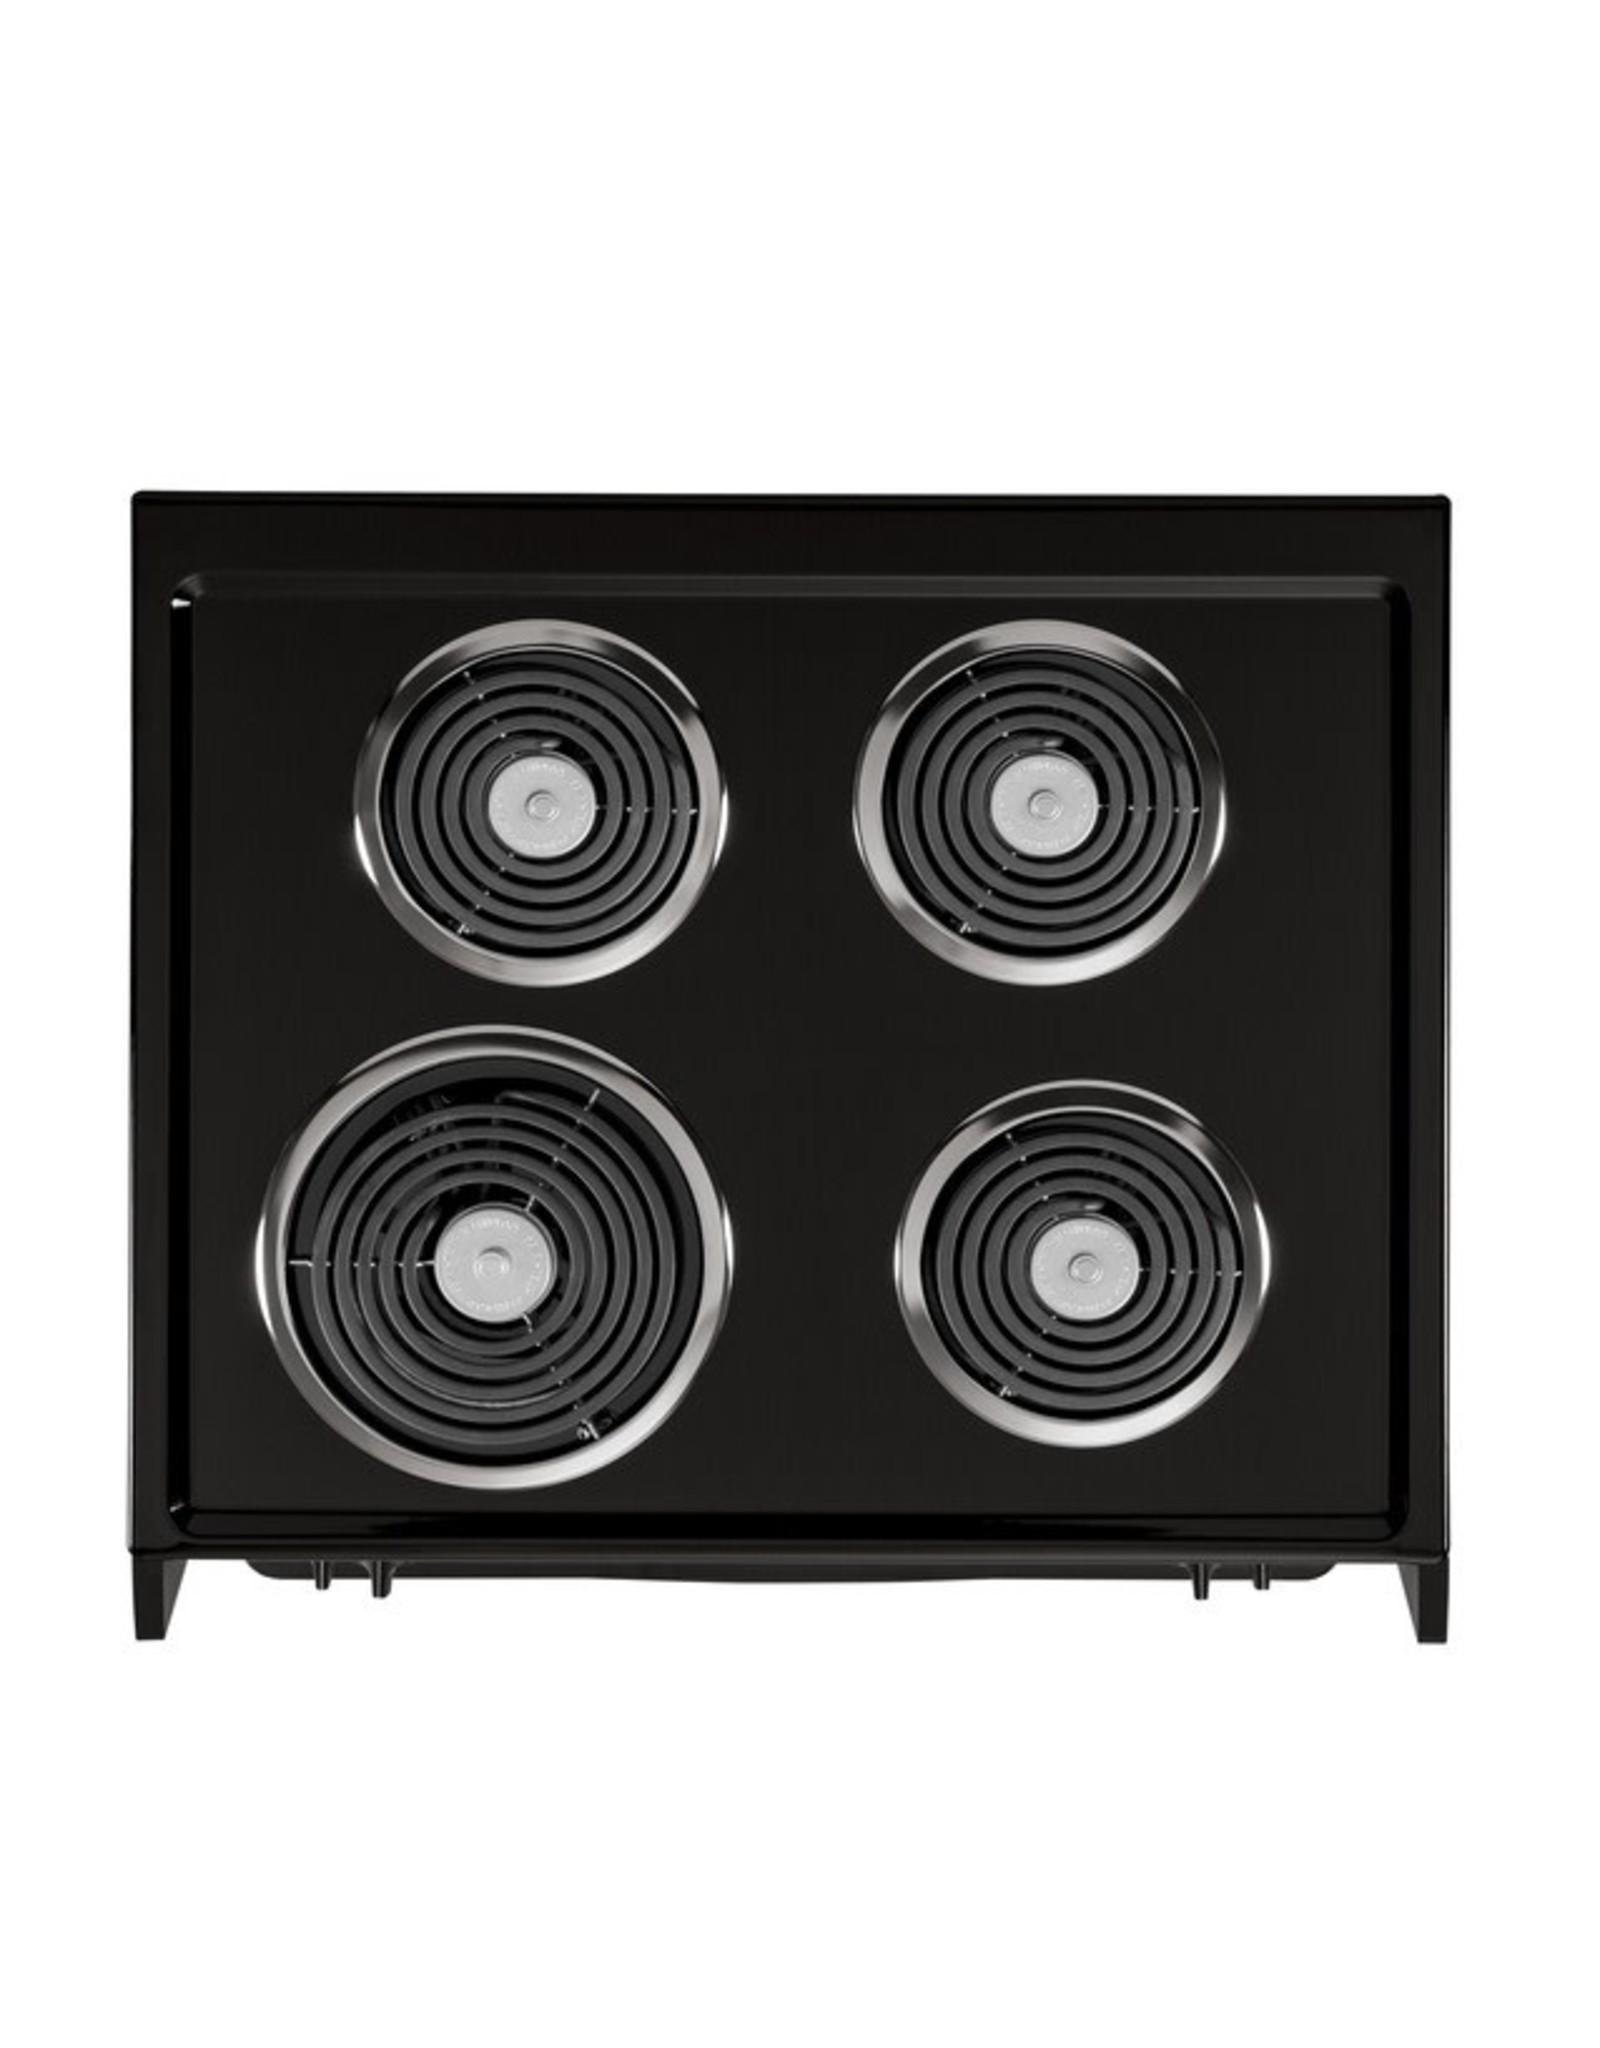 GE JM250DFBB GE 27-in 4 Elements 3-cu ft Self-Cleaning Drop-In Electric Range (Black)